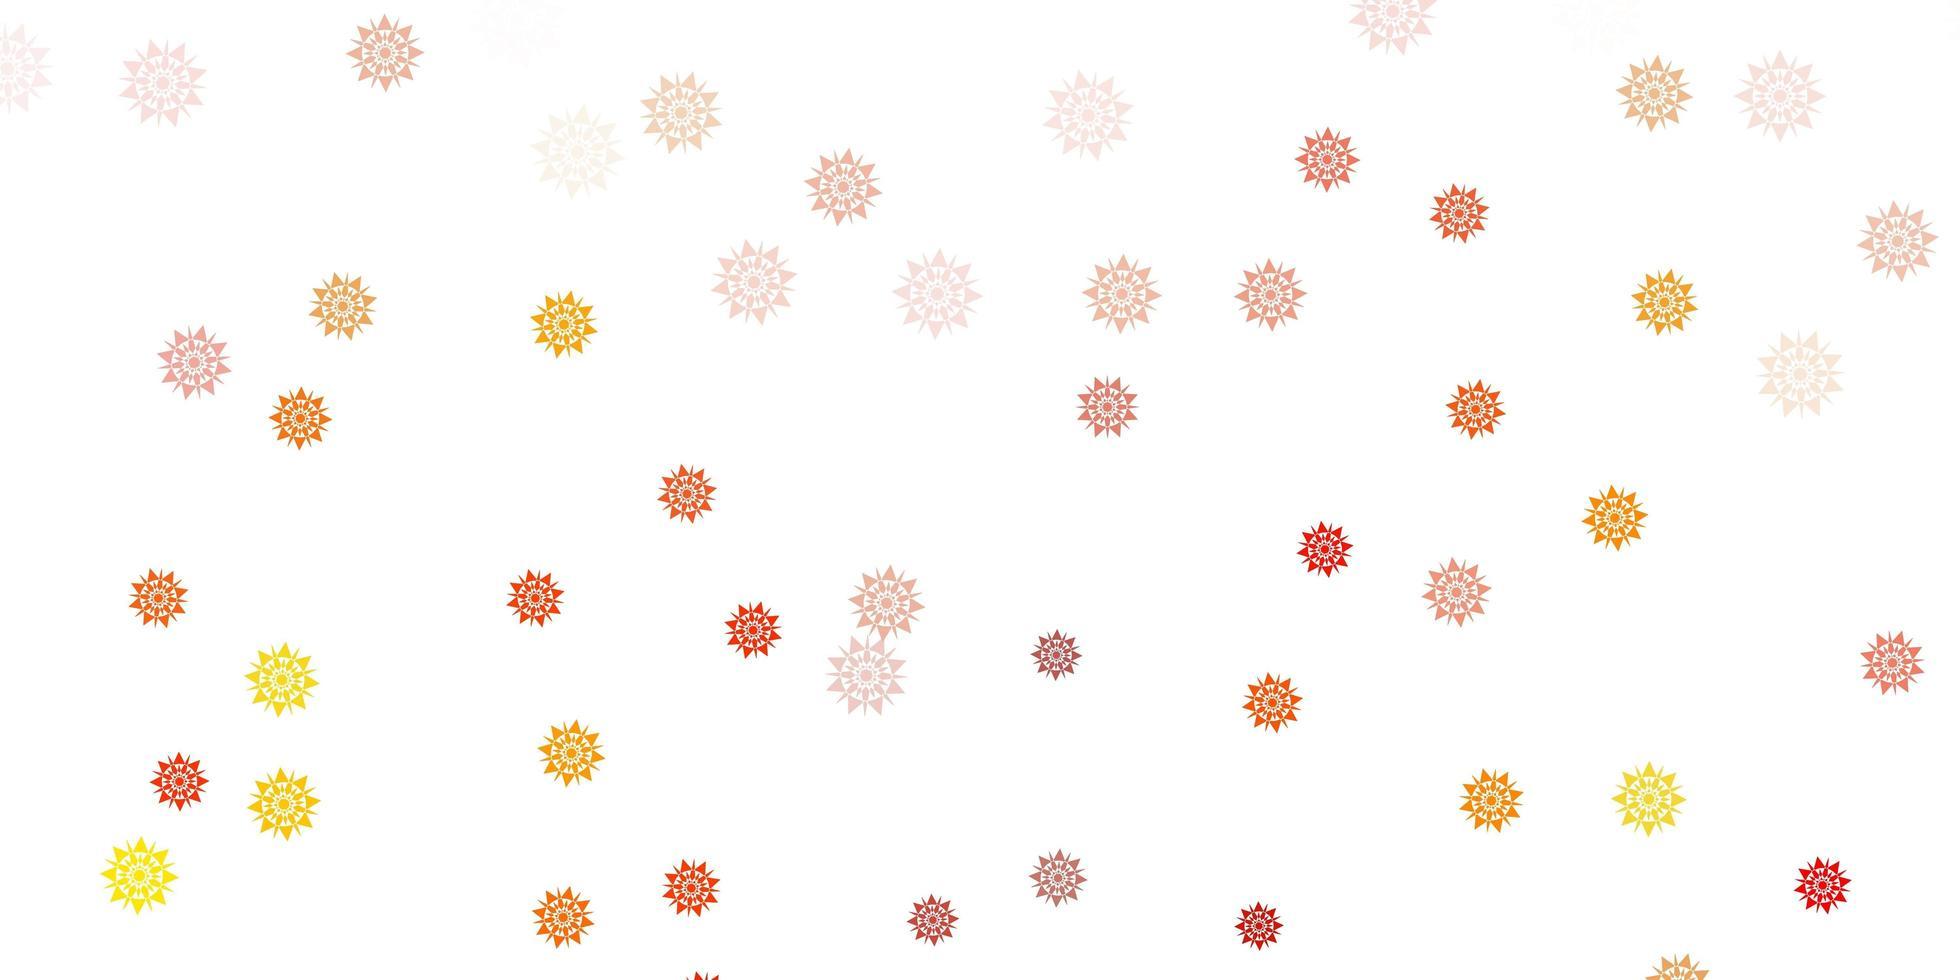 ljus orange vektor layout med vackra snöflingor.